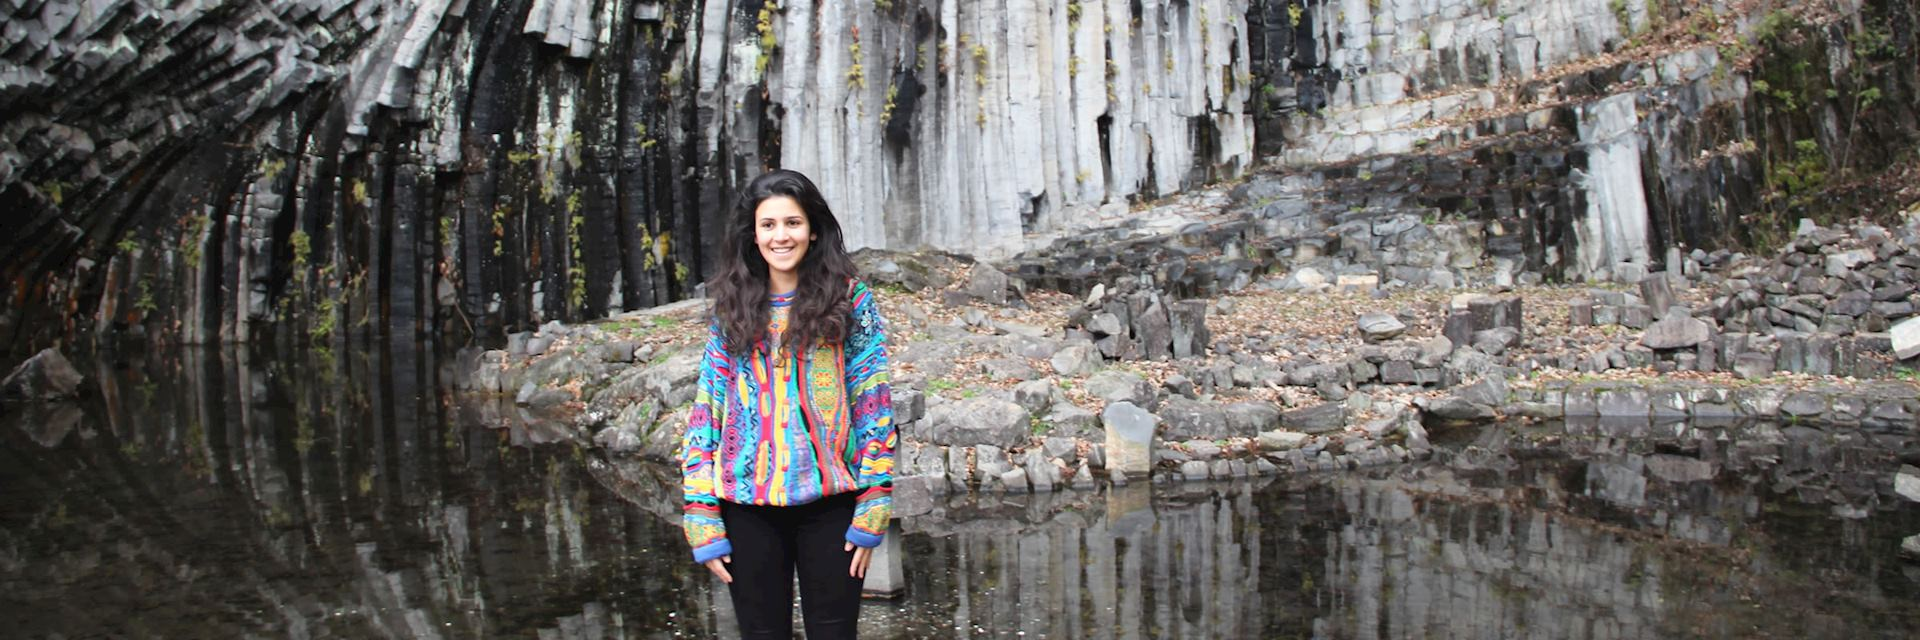 Leeona in Genbudo Caves, Kinosaki Onsen